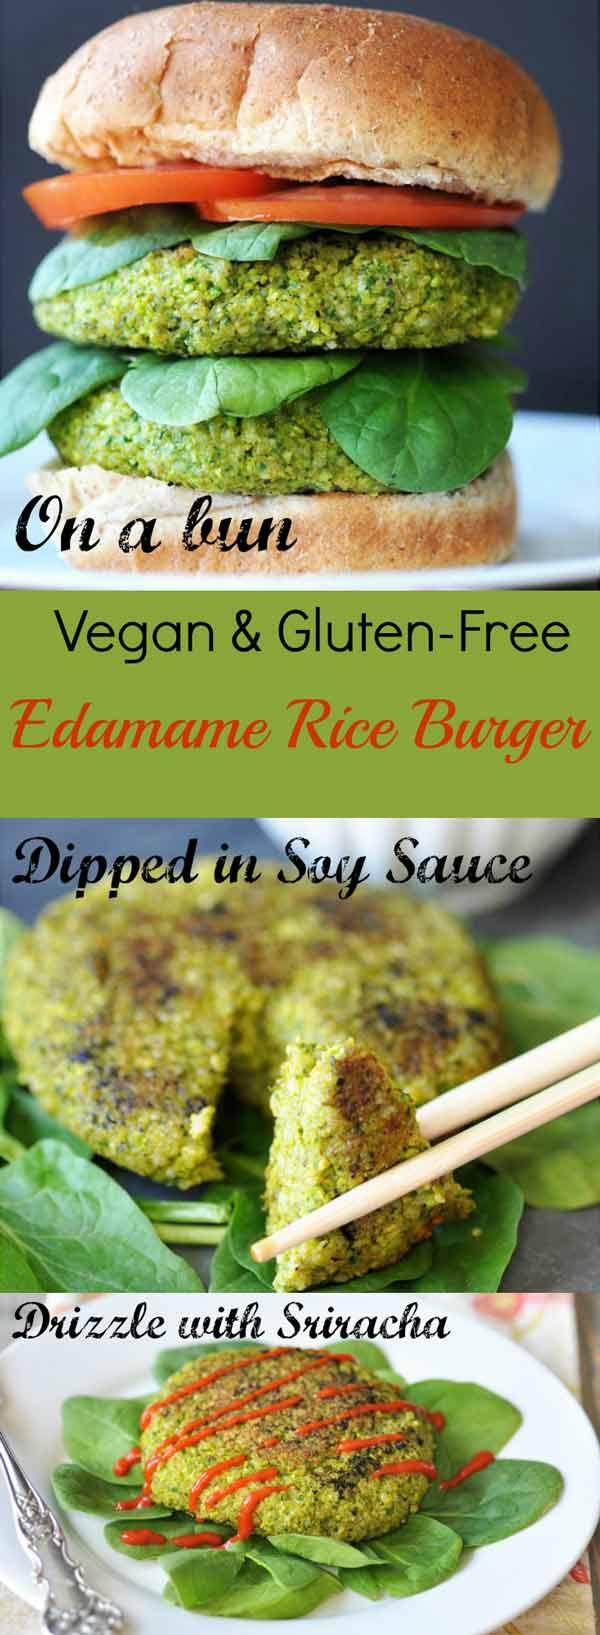 Edamame Rice Burger! This delicious edamame burger recipe is made with ...